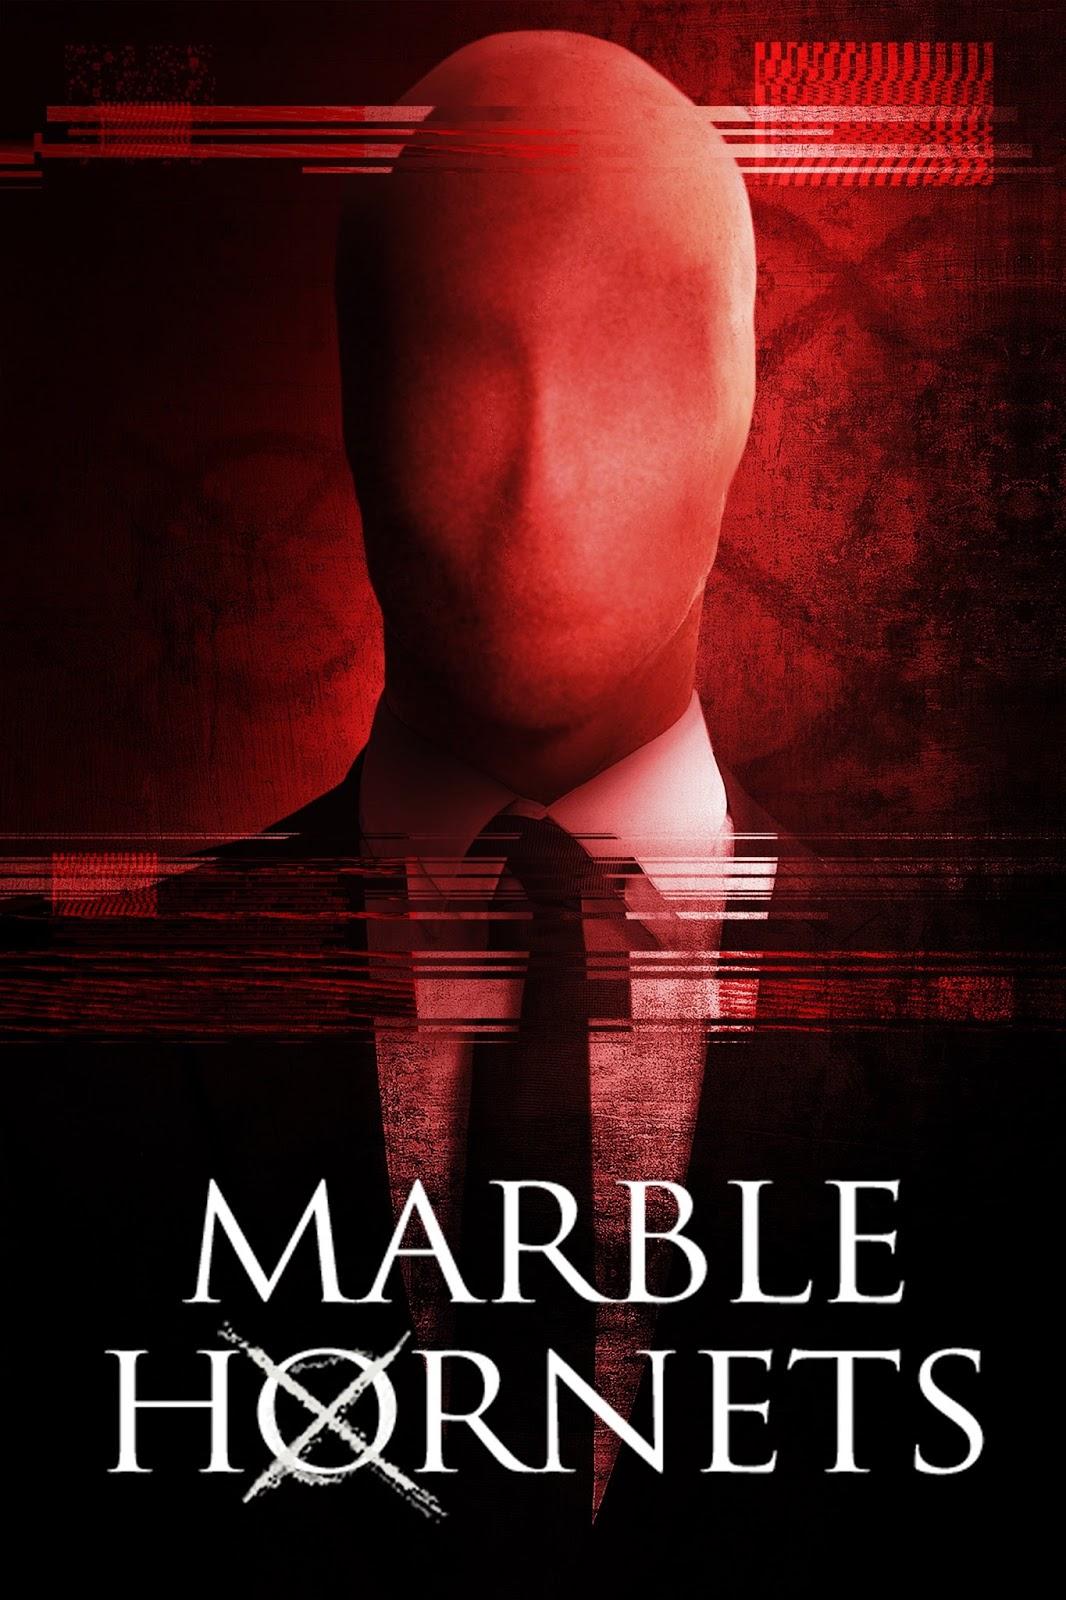 Marble Hornets – Legendado (2015)